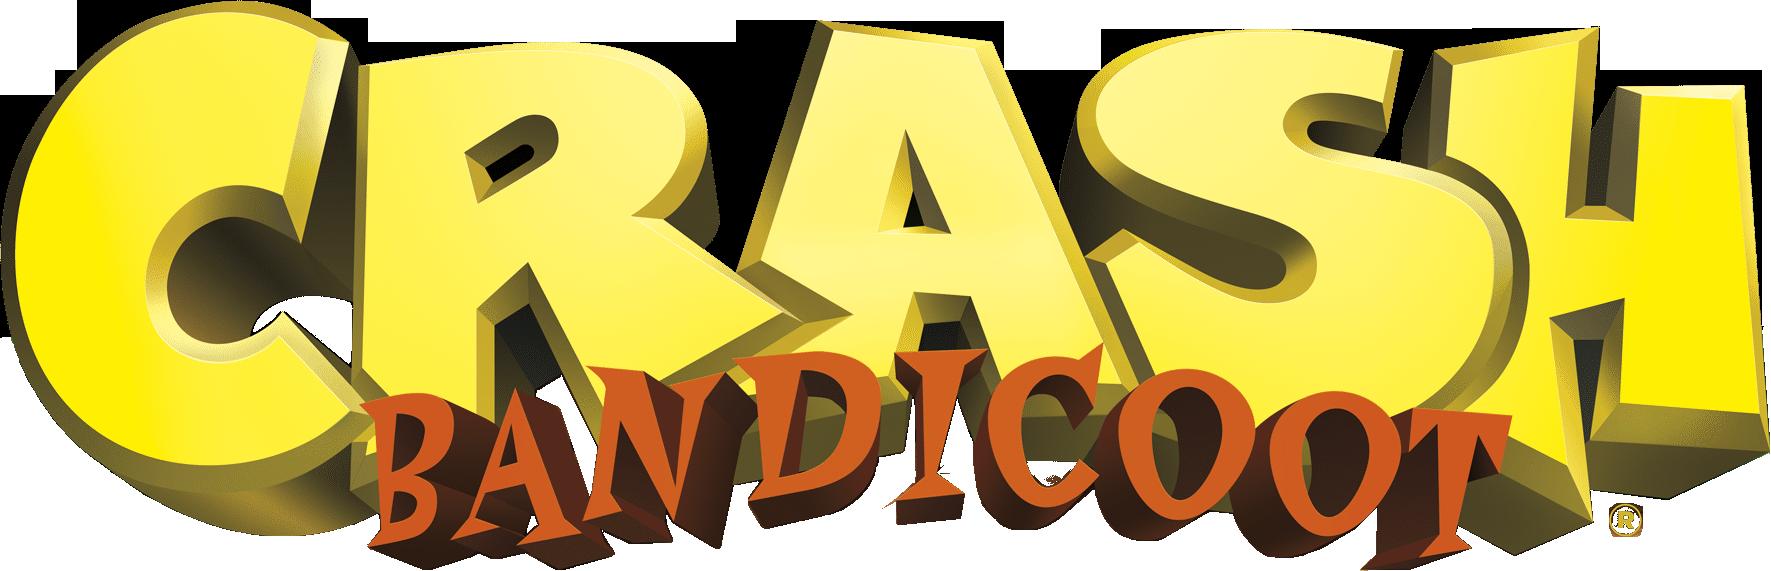 Crash bandicoot cutout